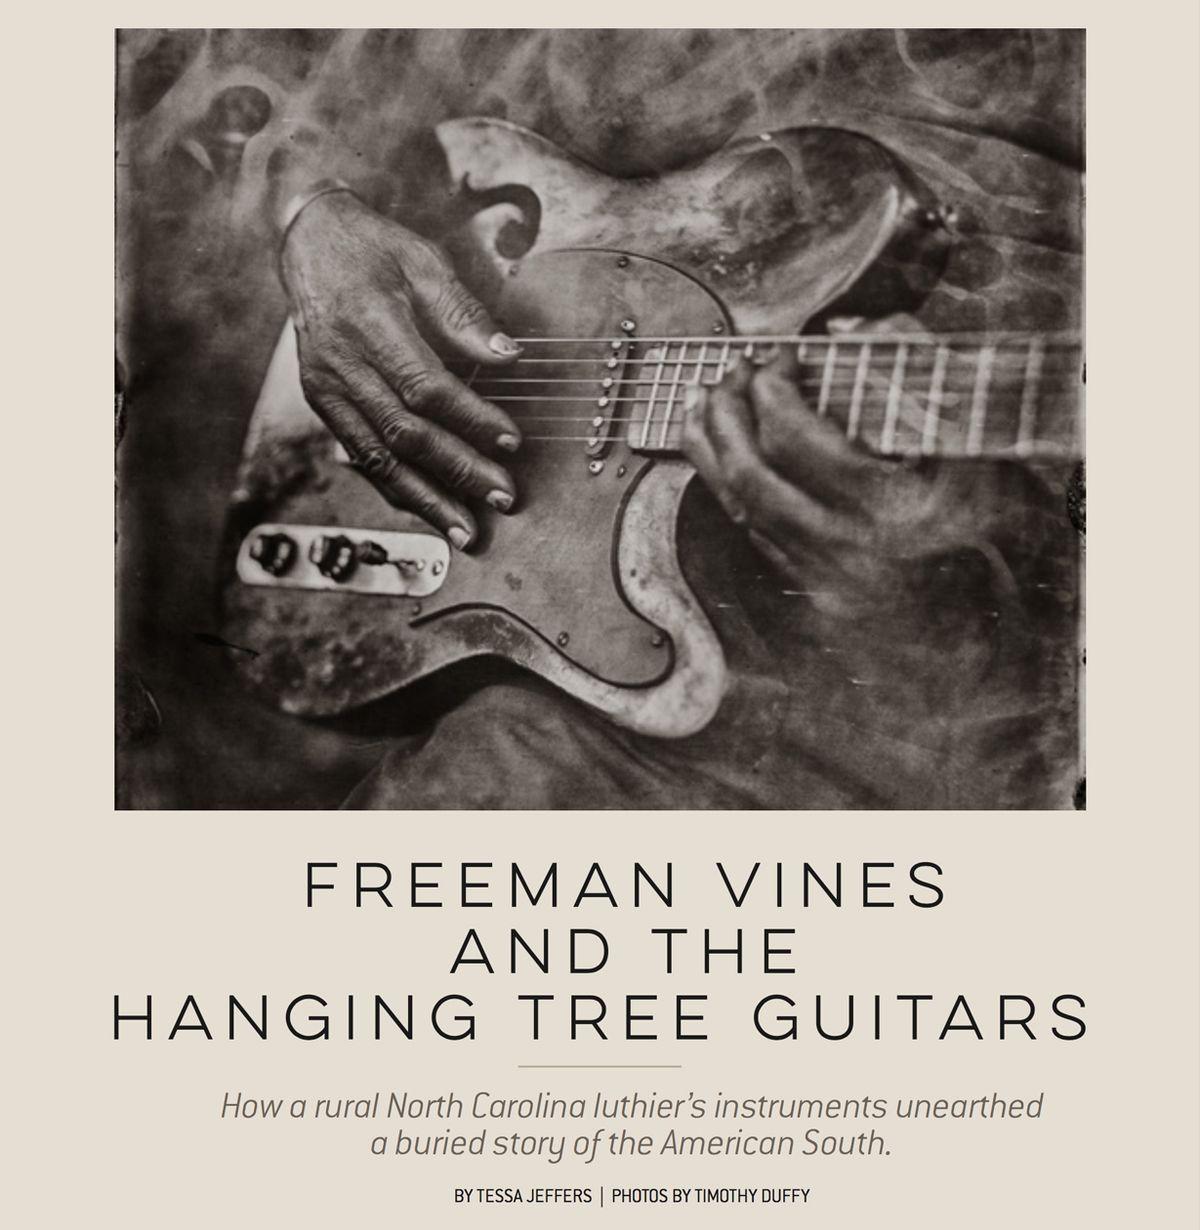 Freeman Vines and the Hanging Tree Guitars